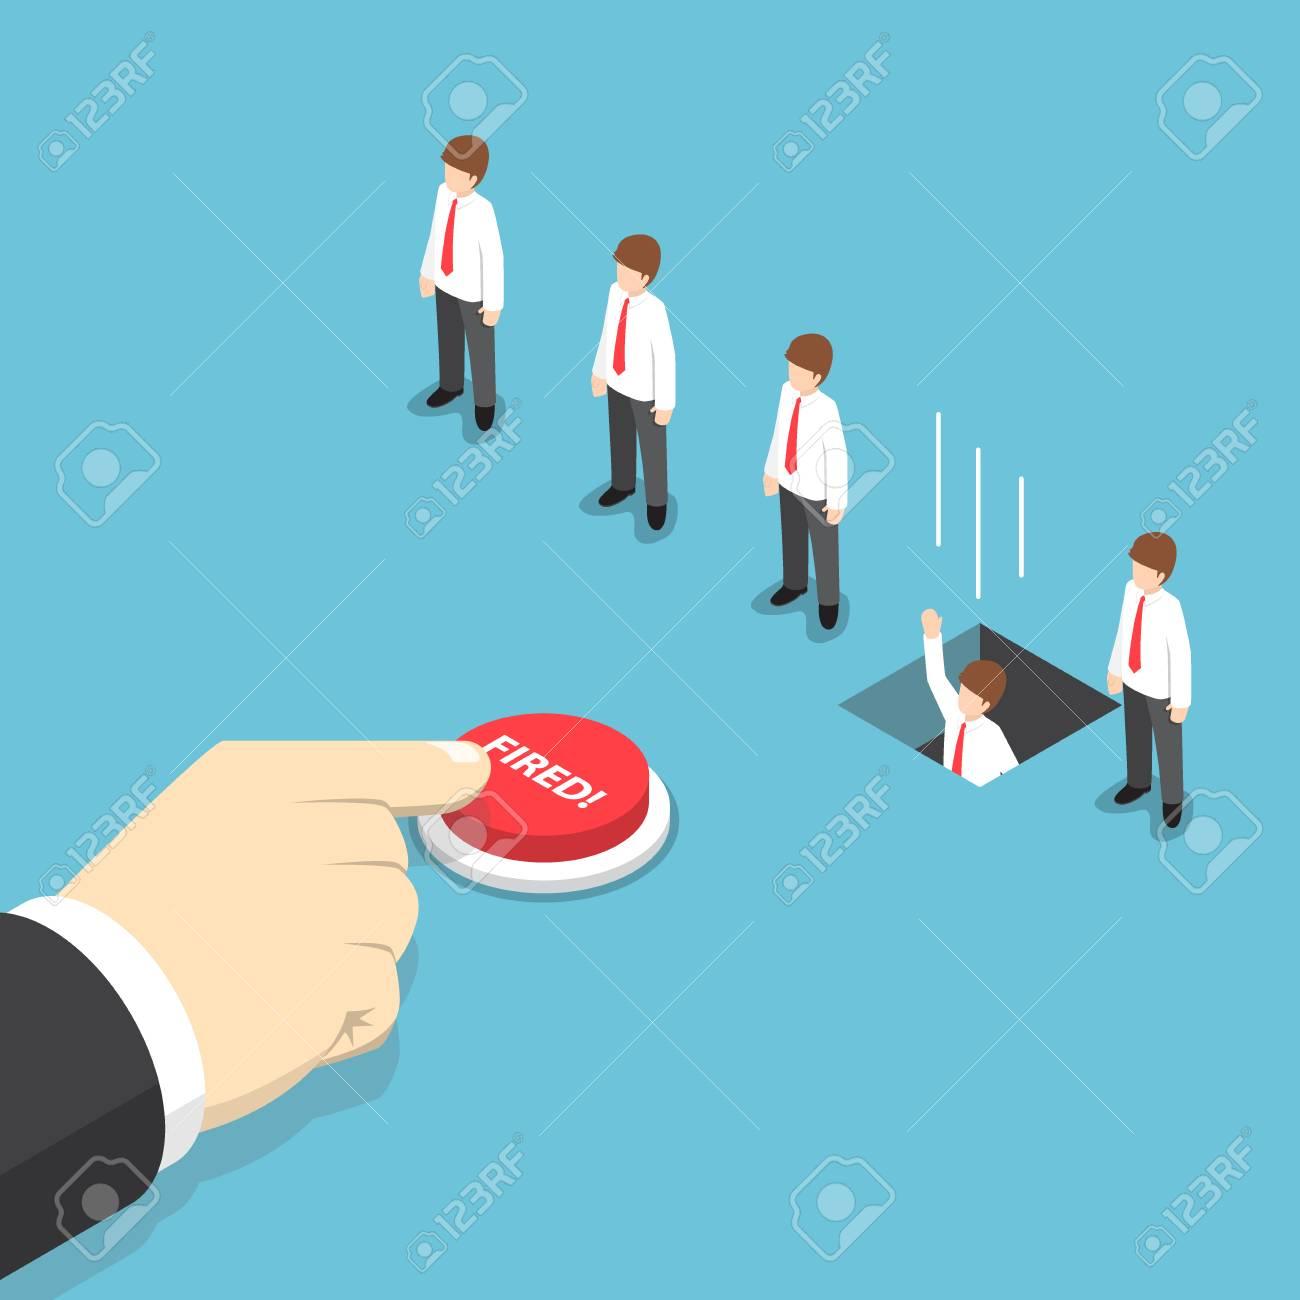 gefeuert